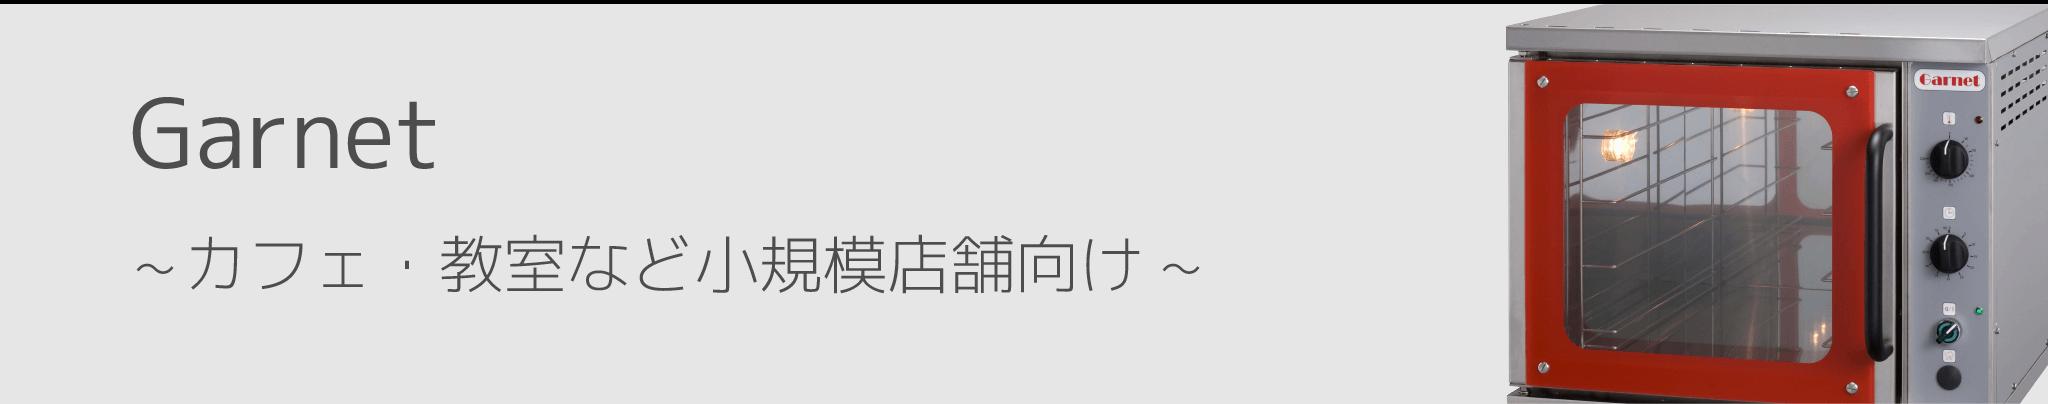 Gaenet〜カフェ・教室など小規模店舗向け〜